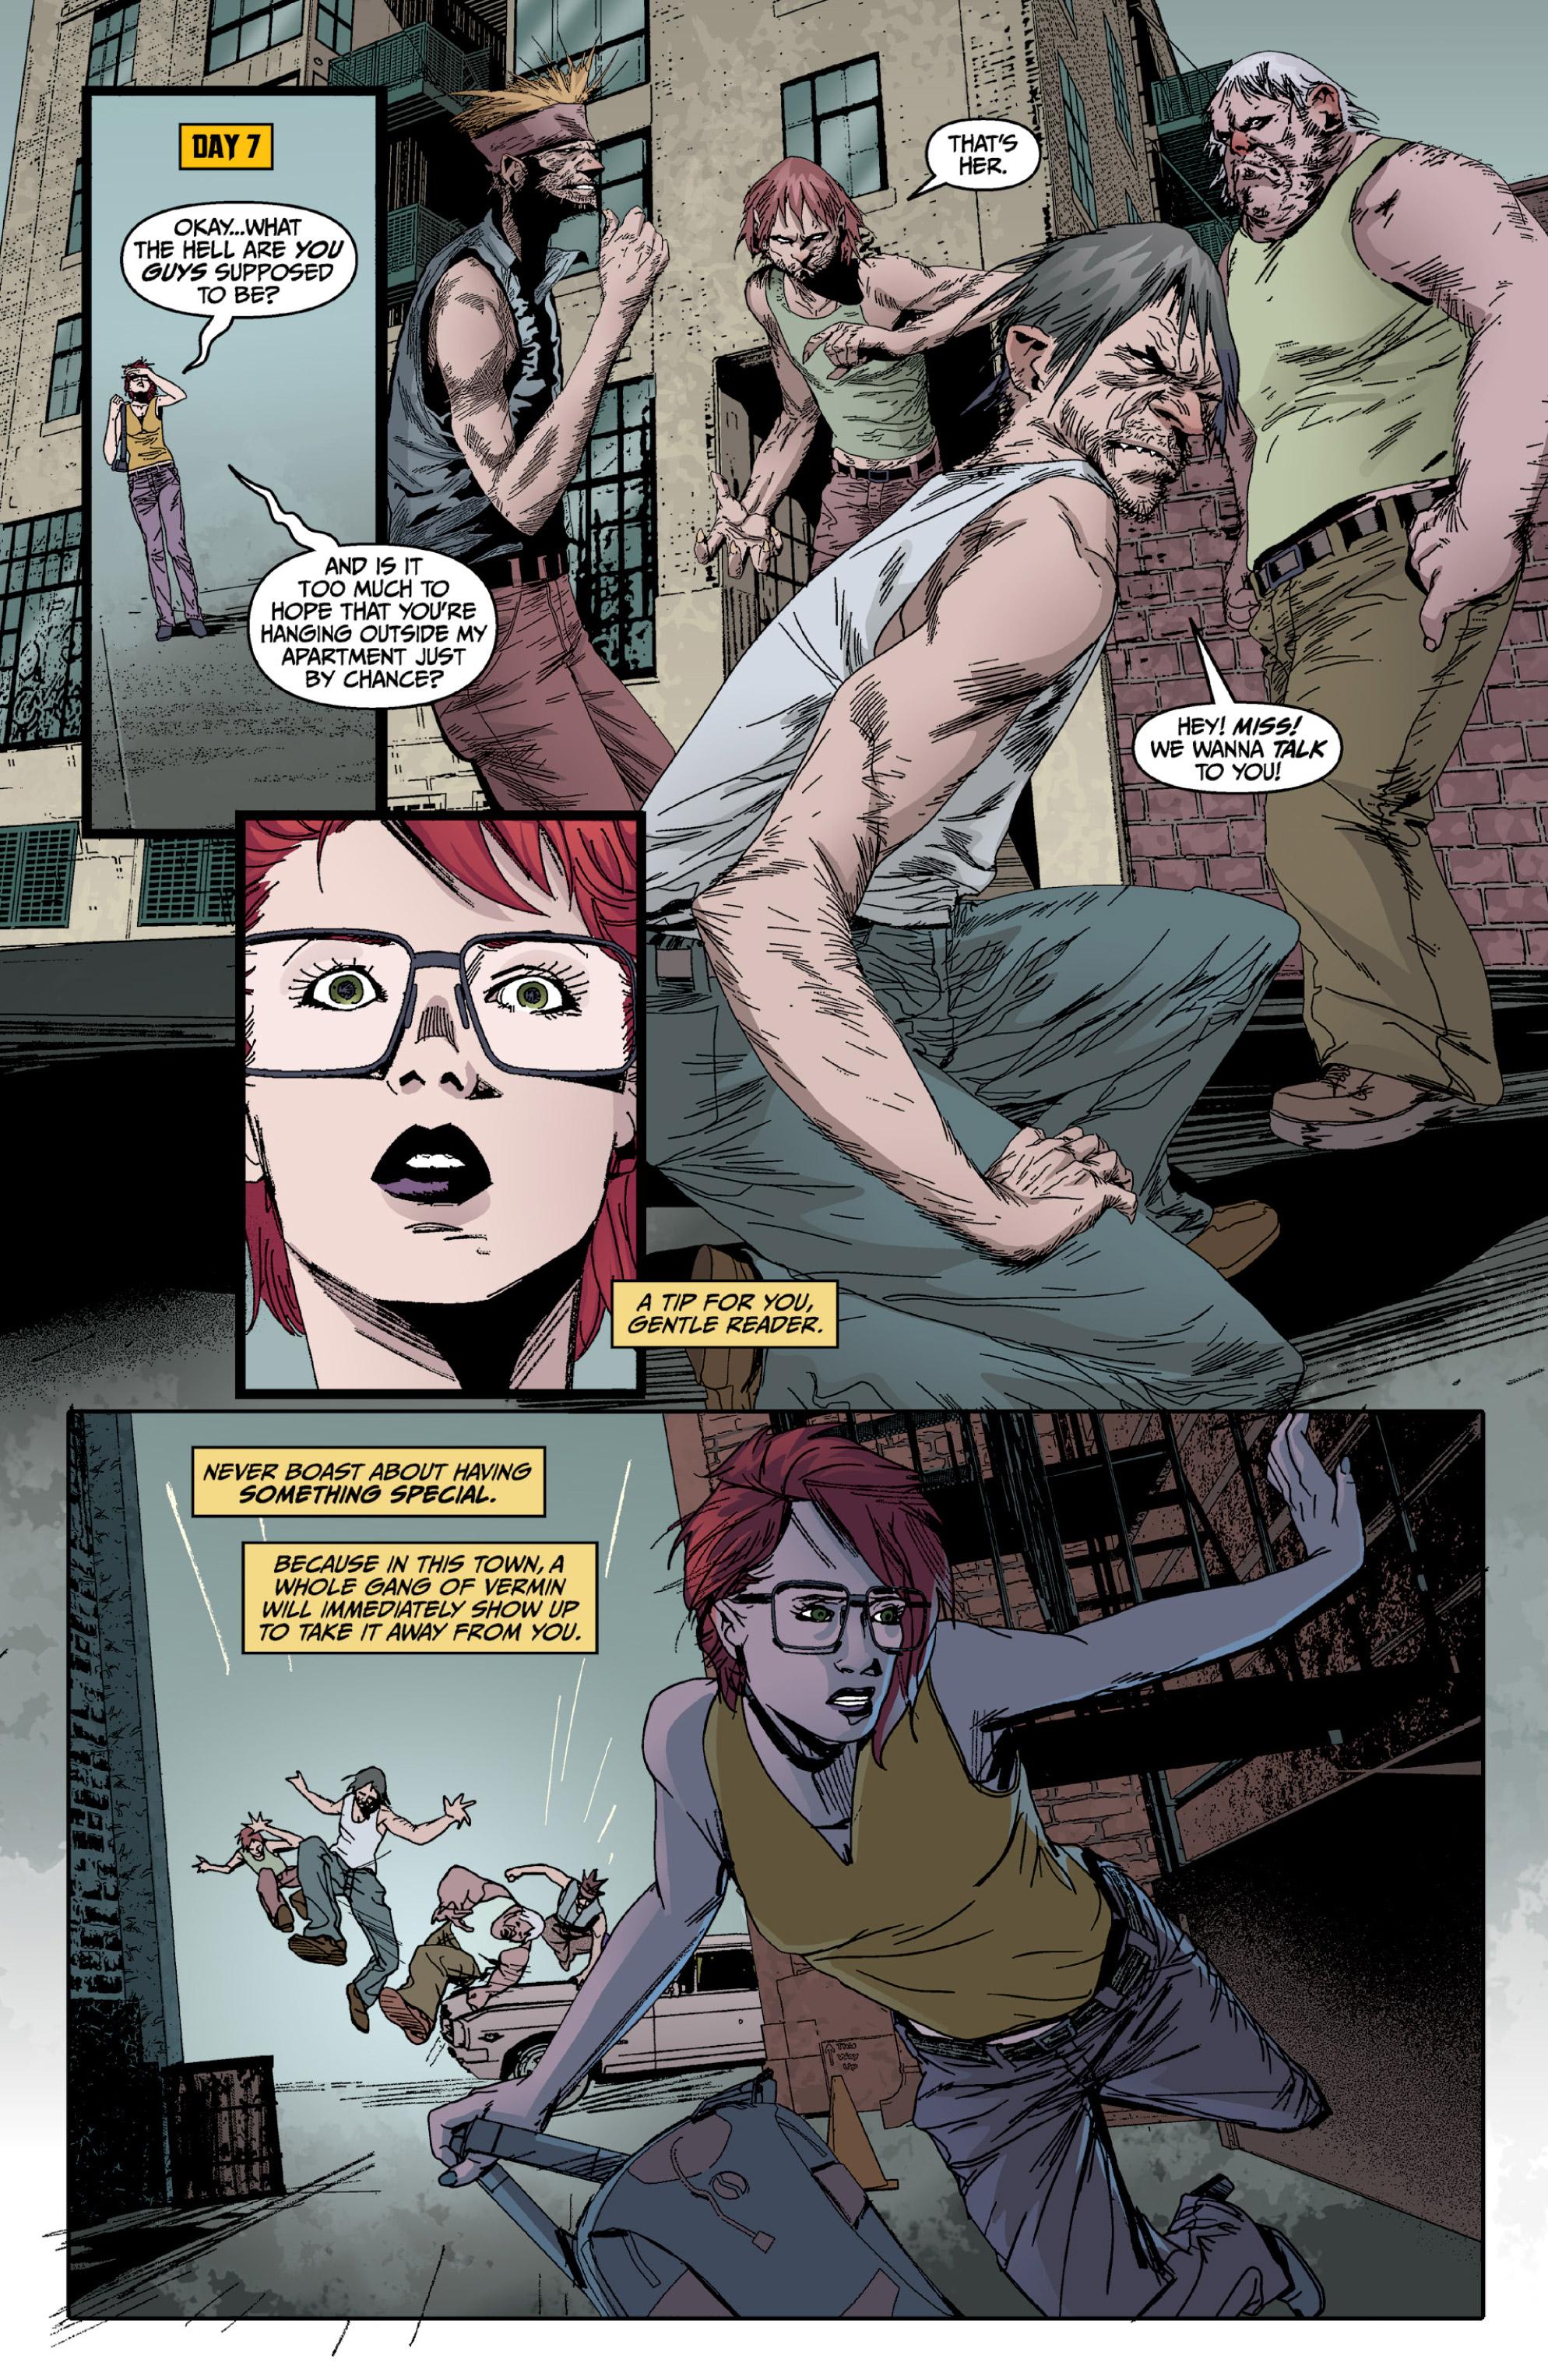 Read online X: Big Bad comic -  Issue # Full - 82